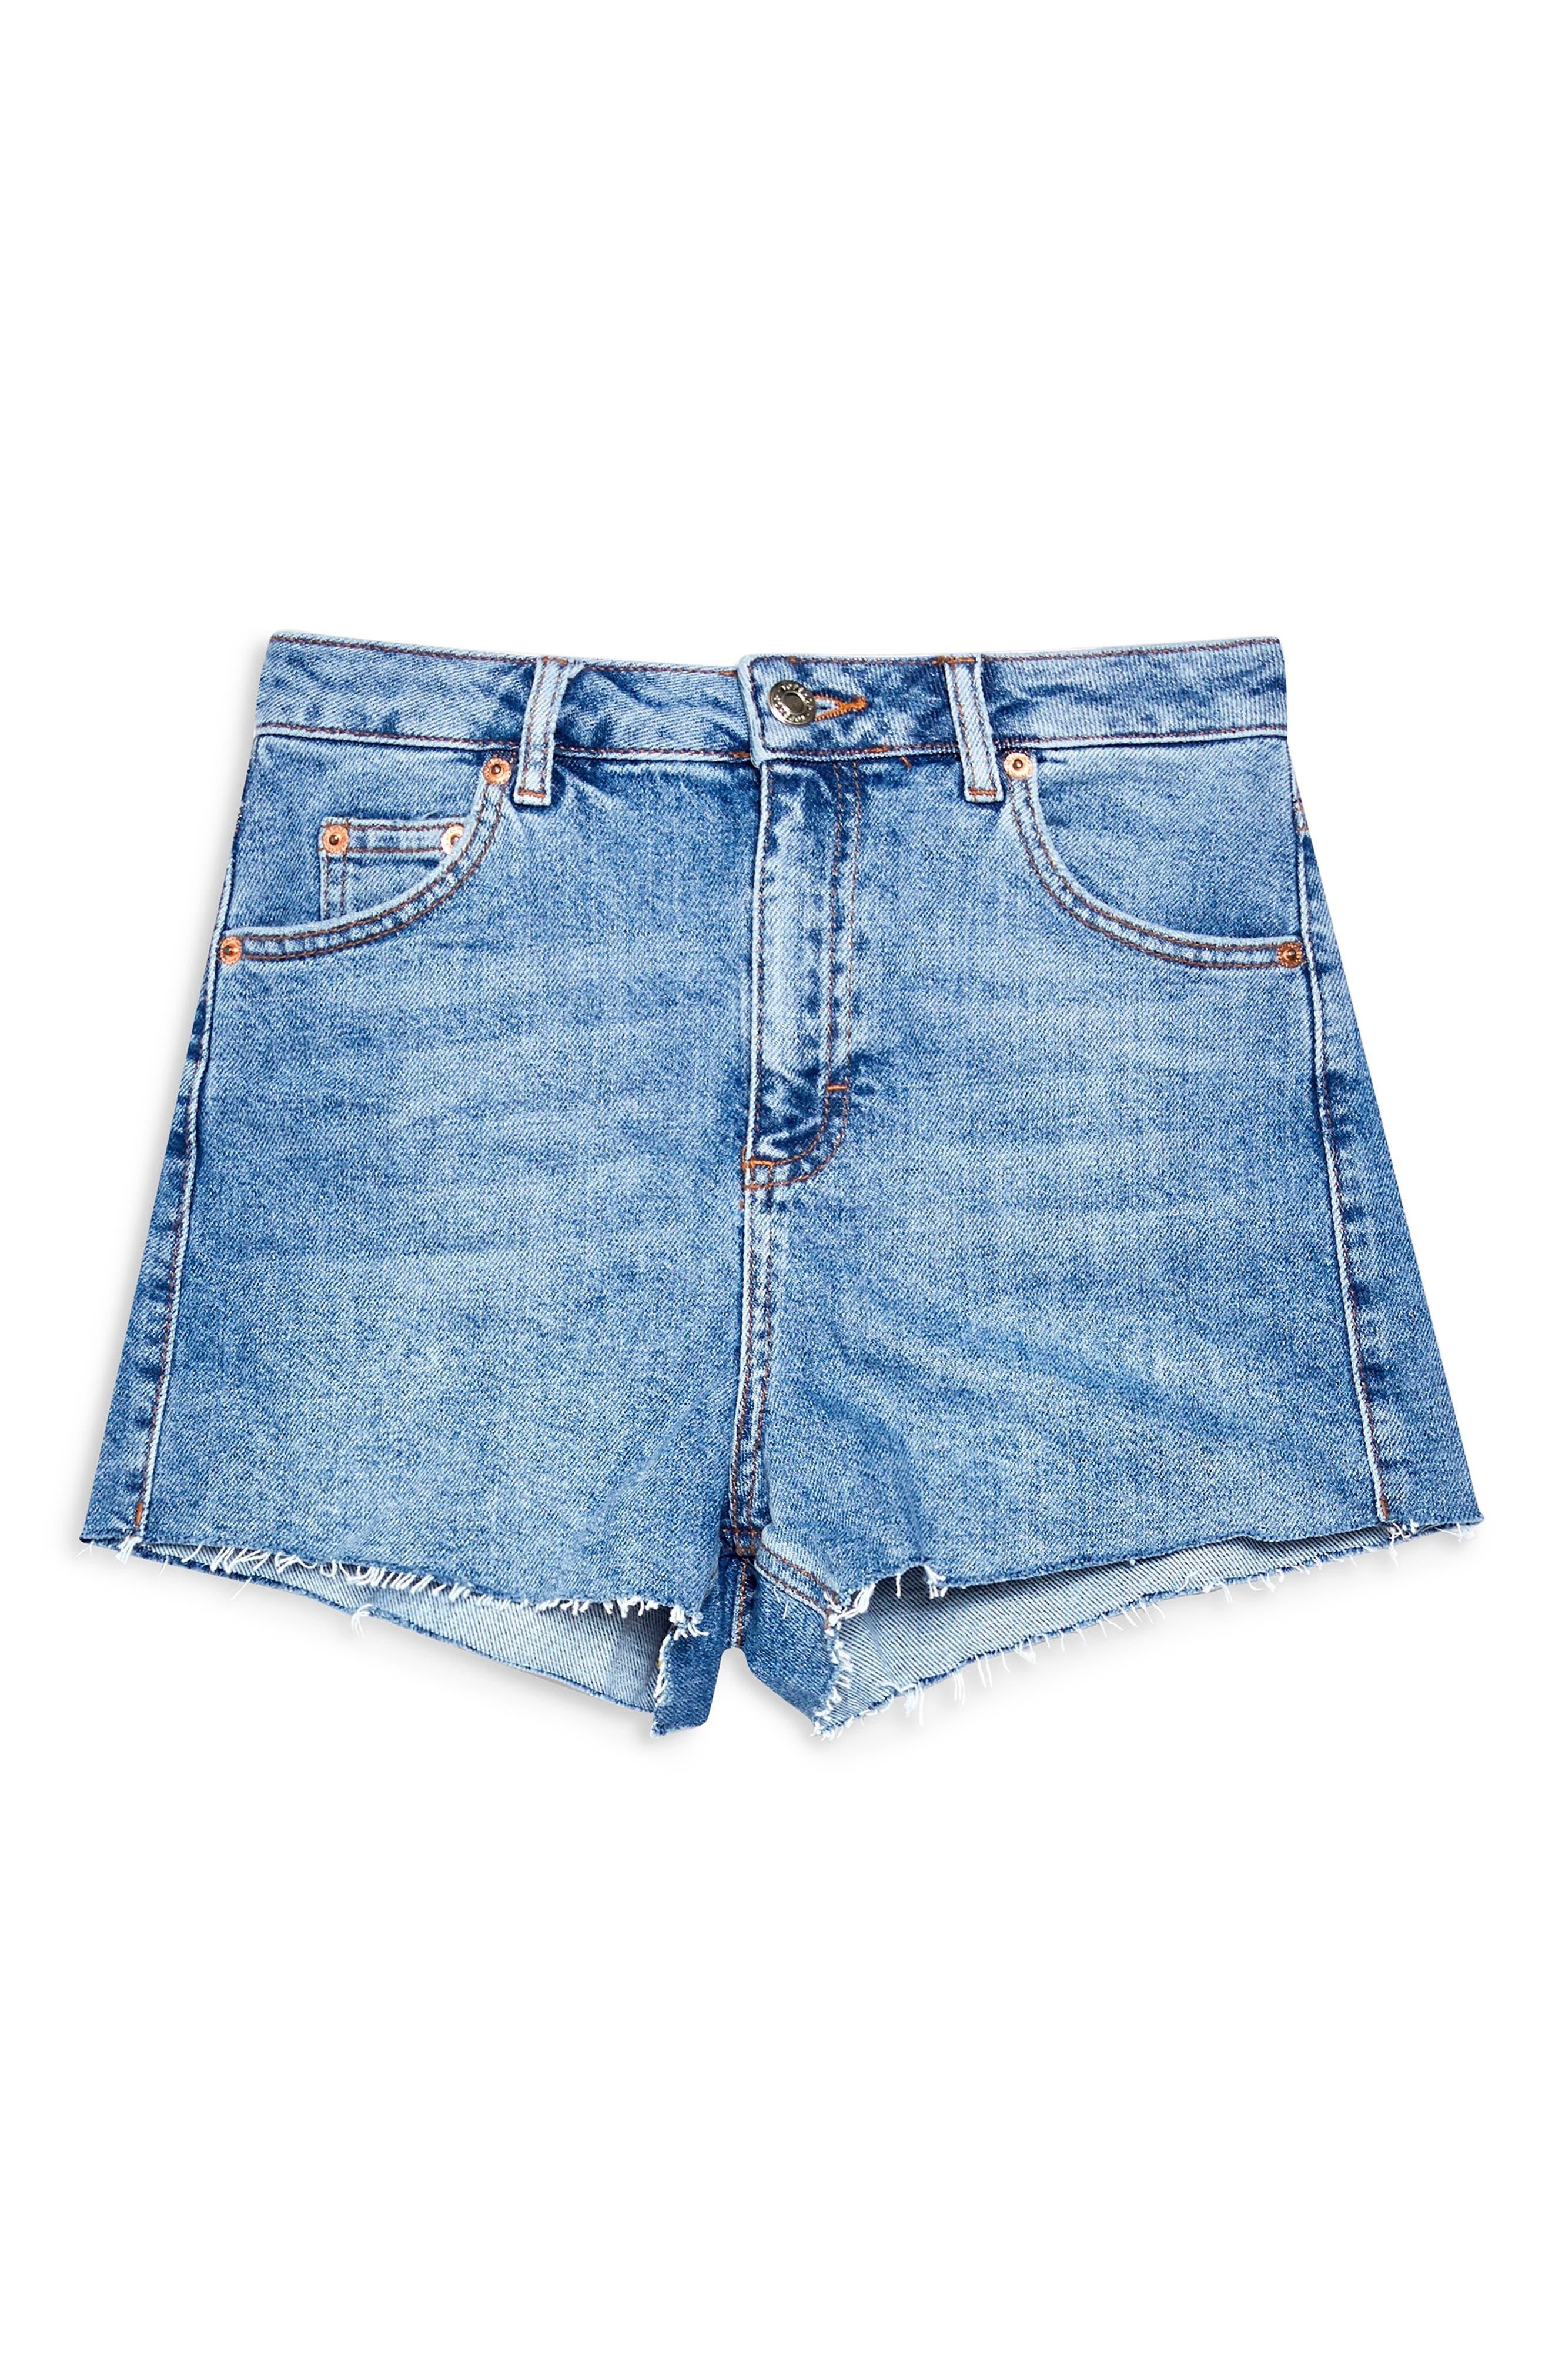 TOPSHOP, Premium Denim Mom Shorts, Alternate thumbnail 5, color, MID DENIM